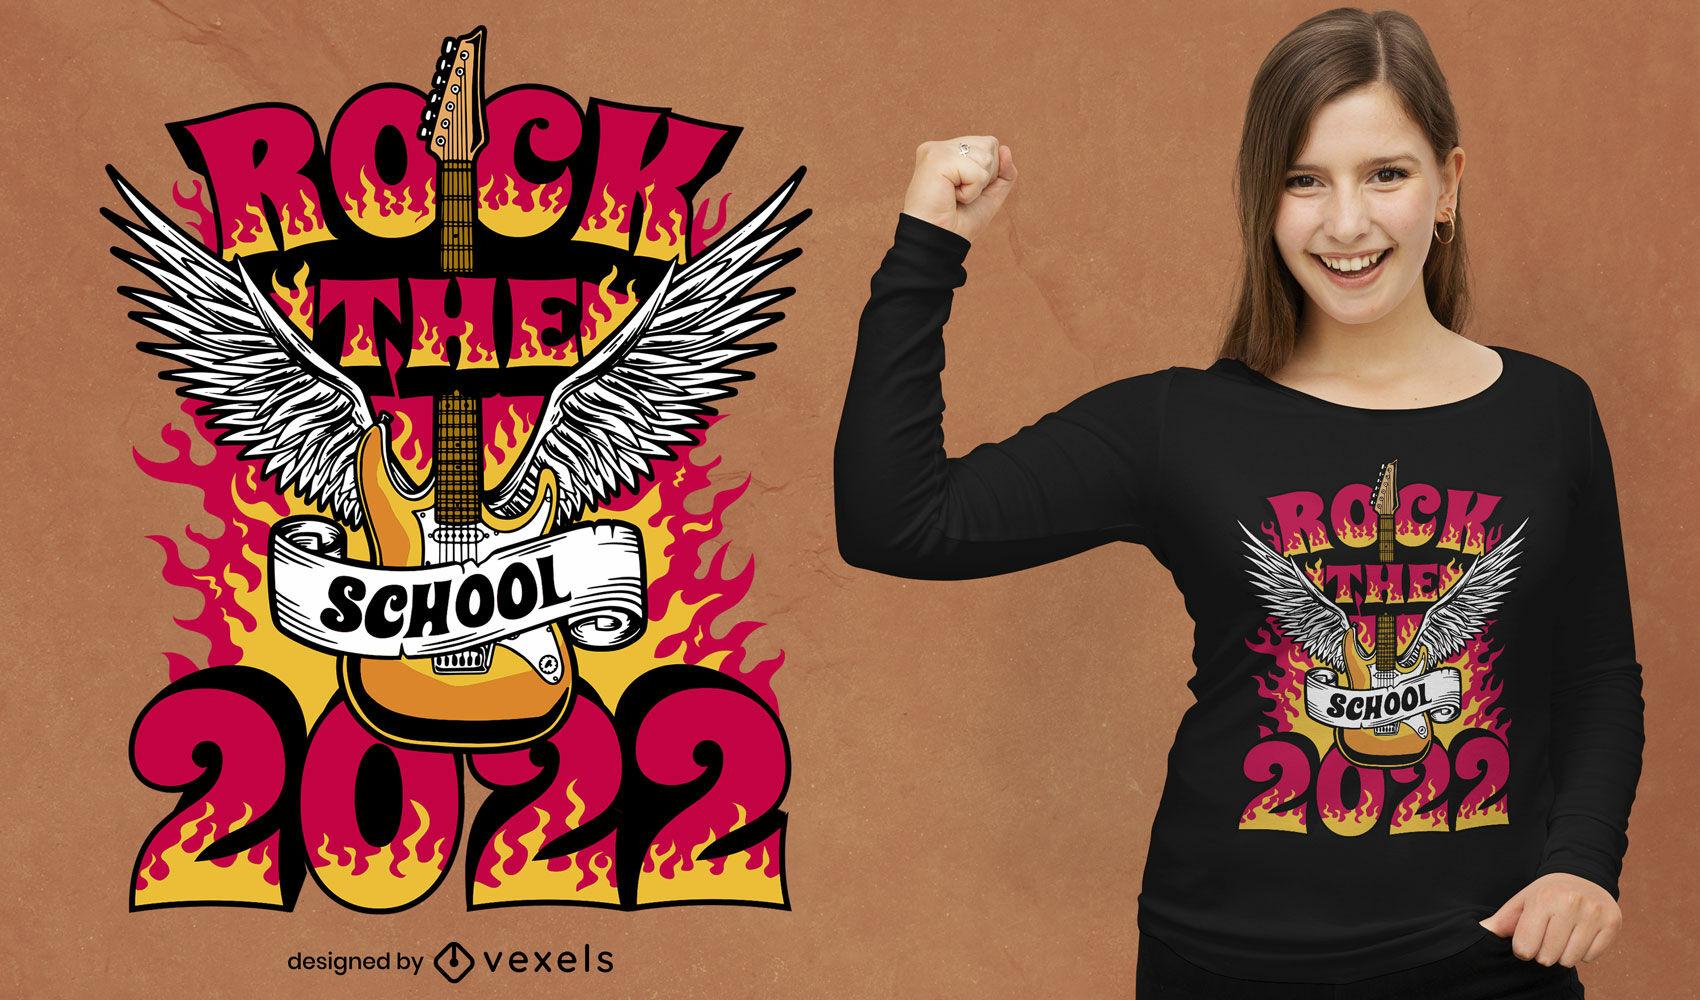 Back to school 2022 rock t-shirt design